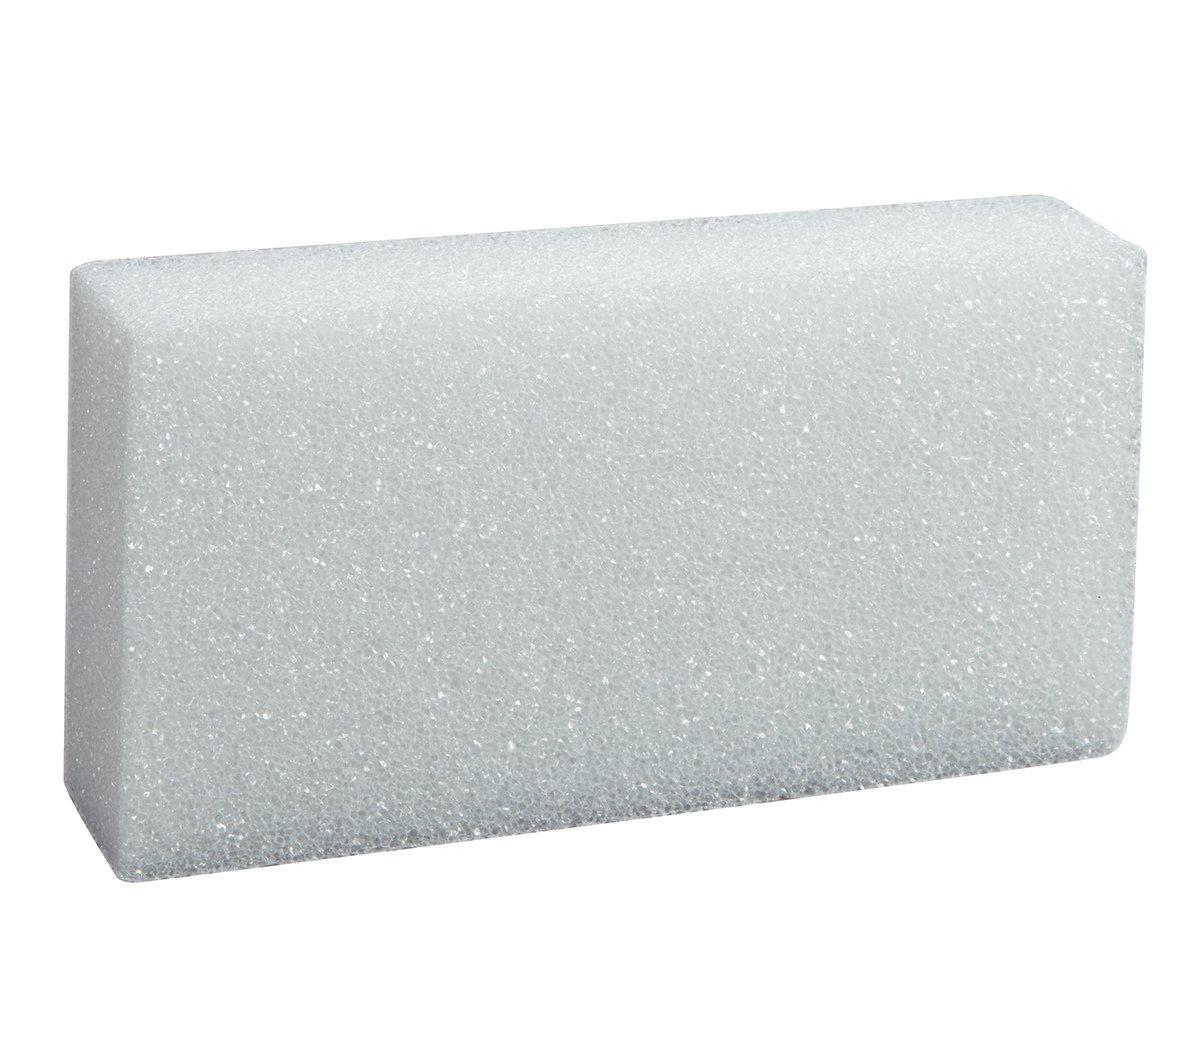 FloraCraft Styrofoam Block 1.1 Inch x 6.6 Inch x 11.8 Inch White B125712WS/36